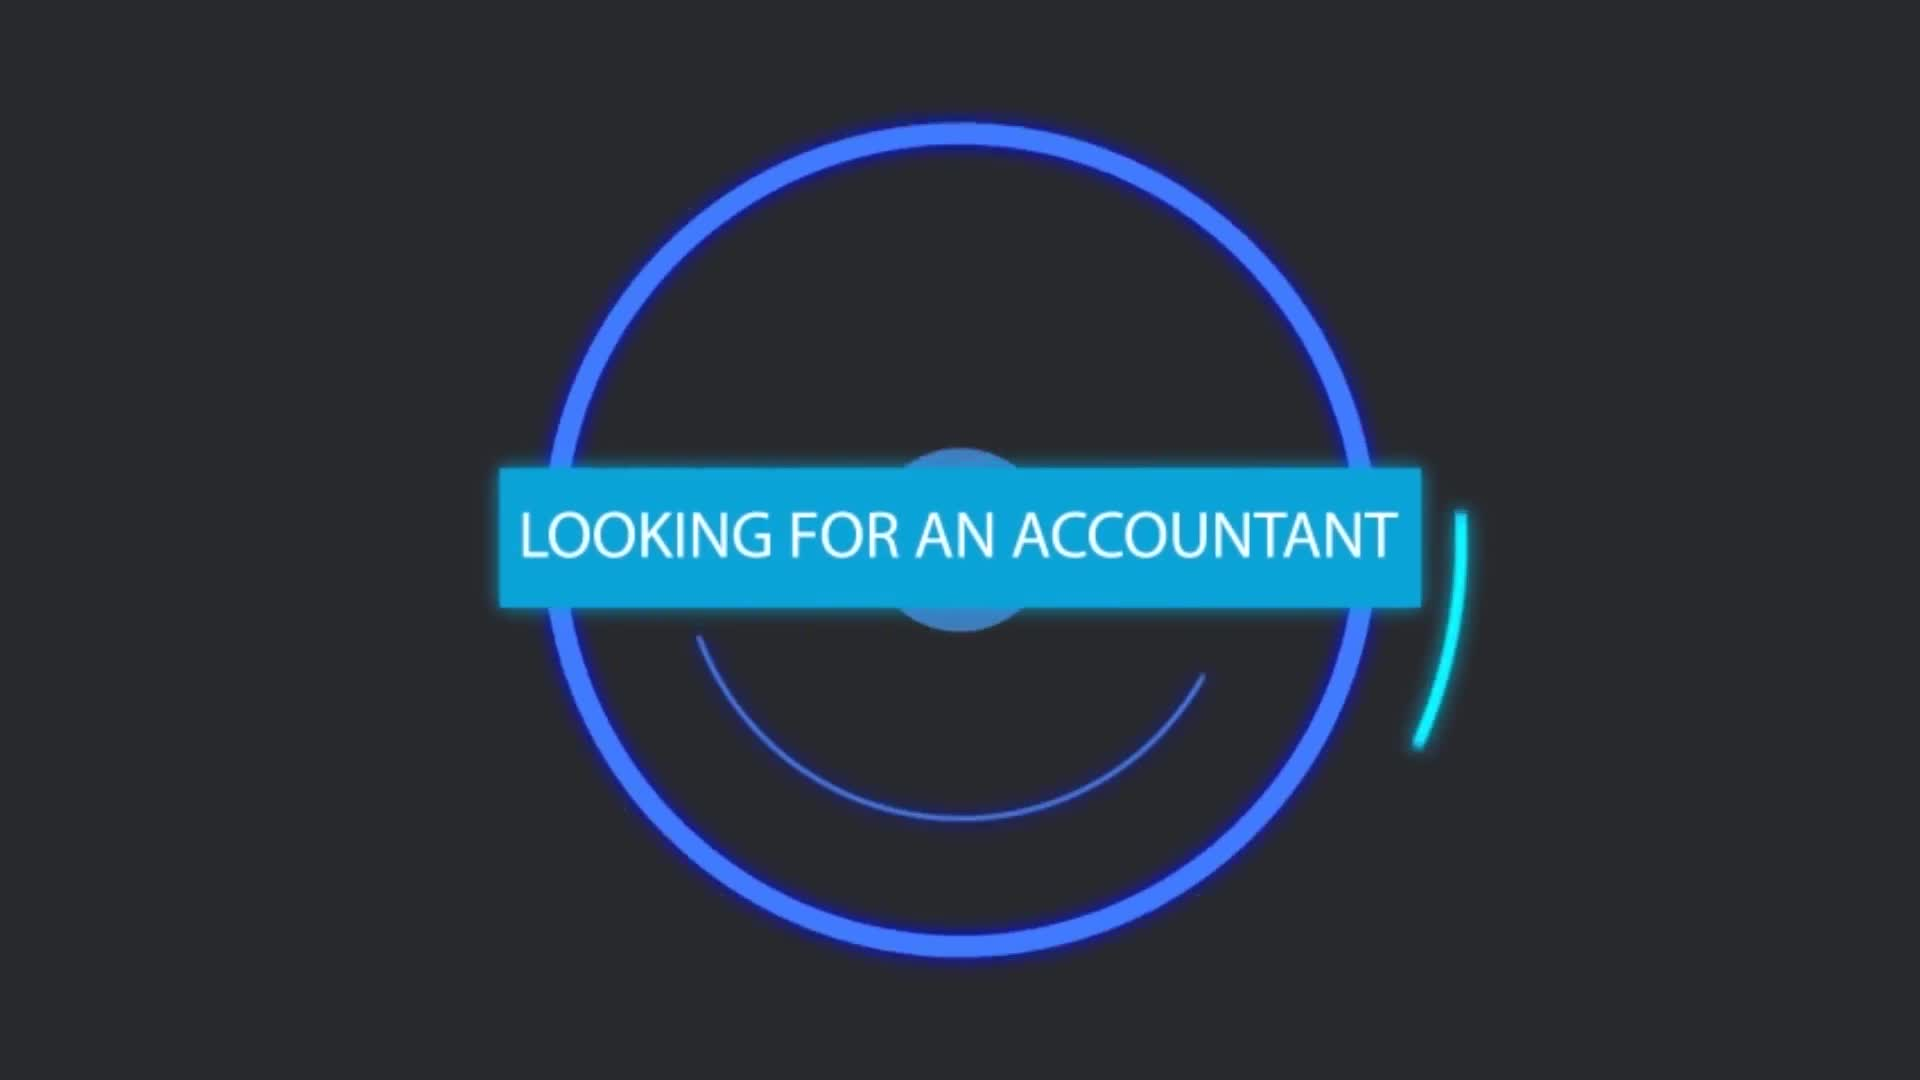 Michele Winger CMA CPA Public Accountant - Accountants - 403-529-9005